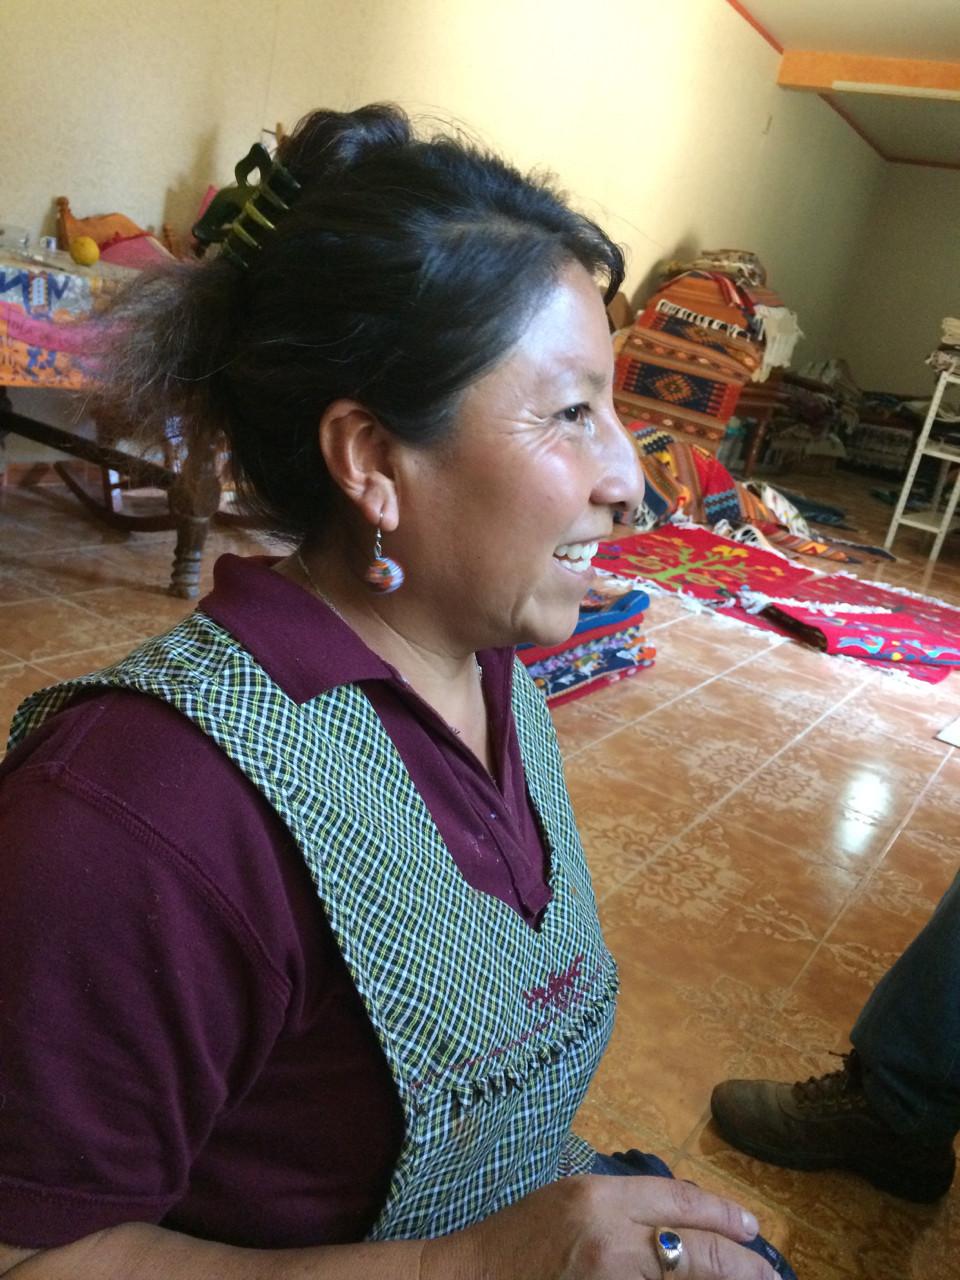 handloomed rugs, handcrafted, talavera